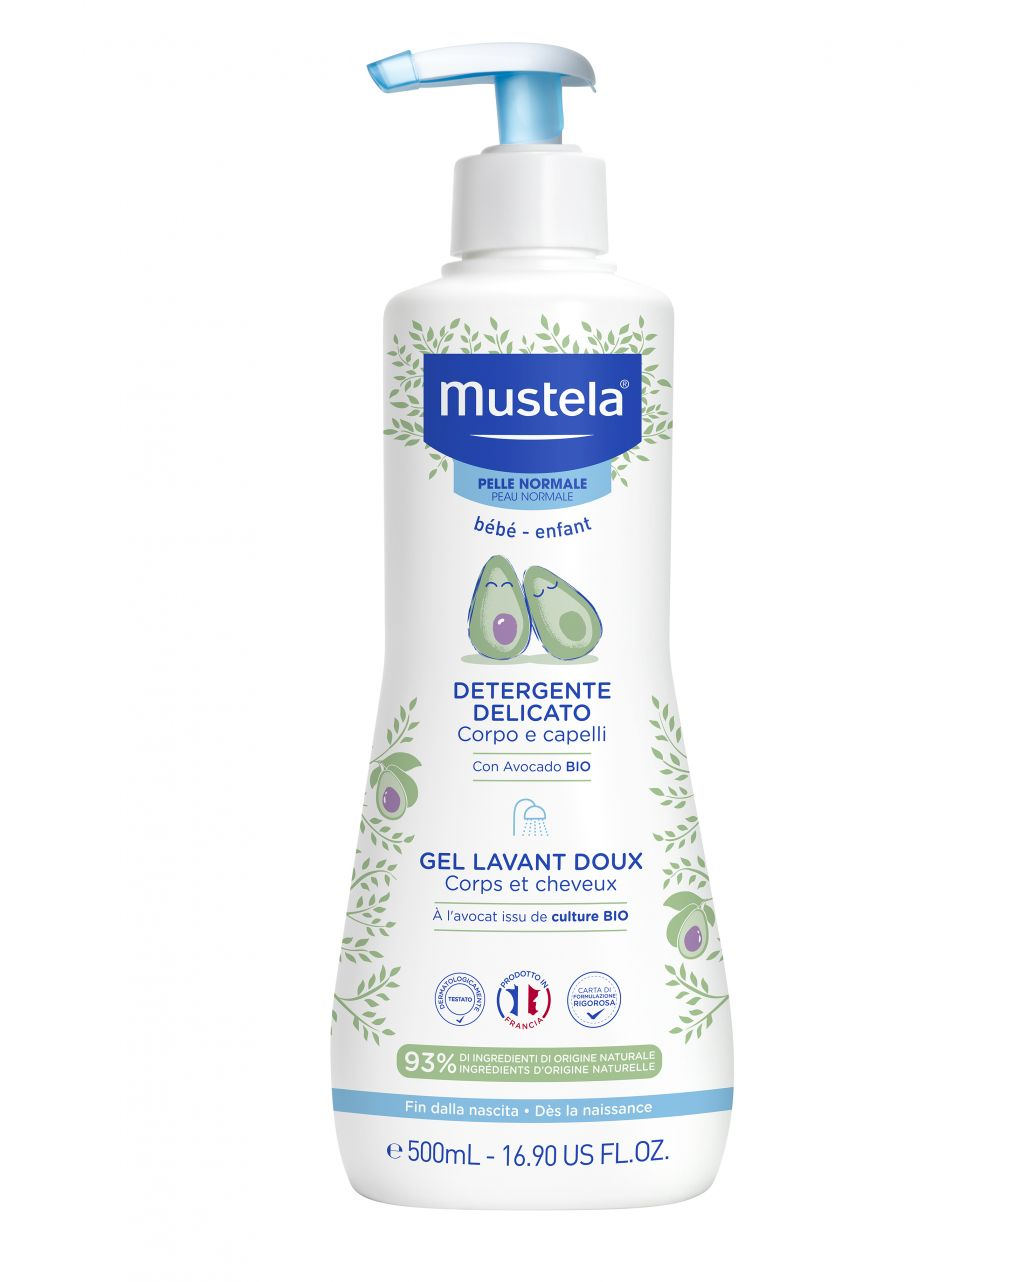 Detergente delicato 500 ml - Mustela